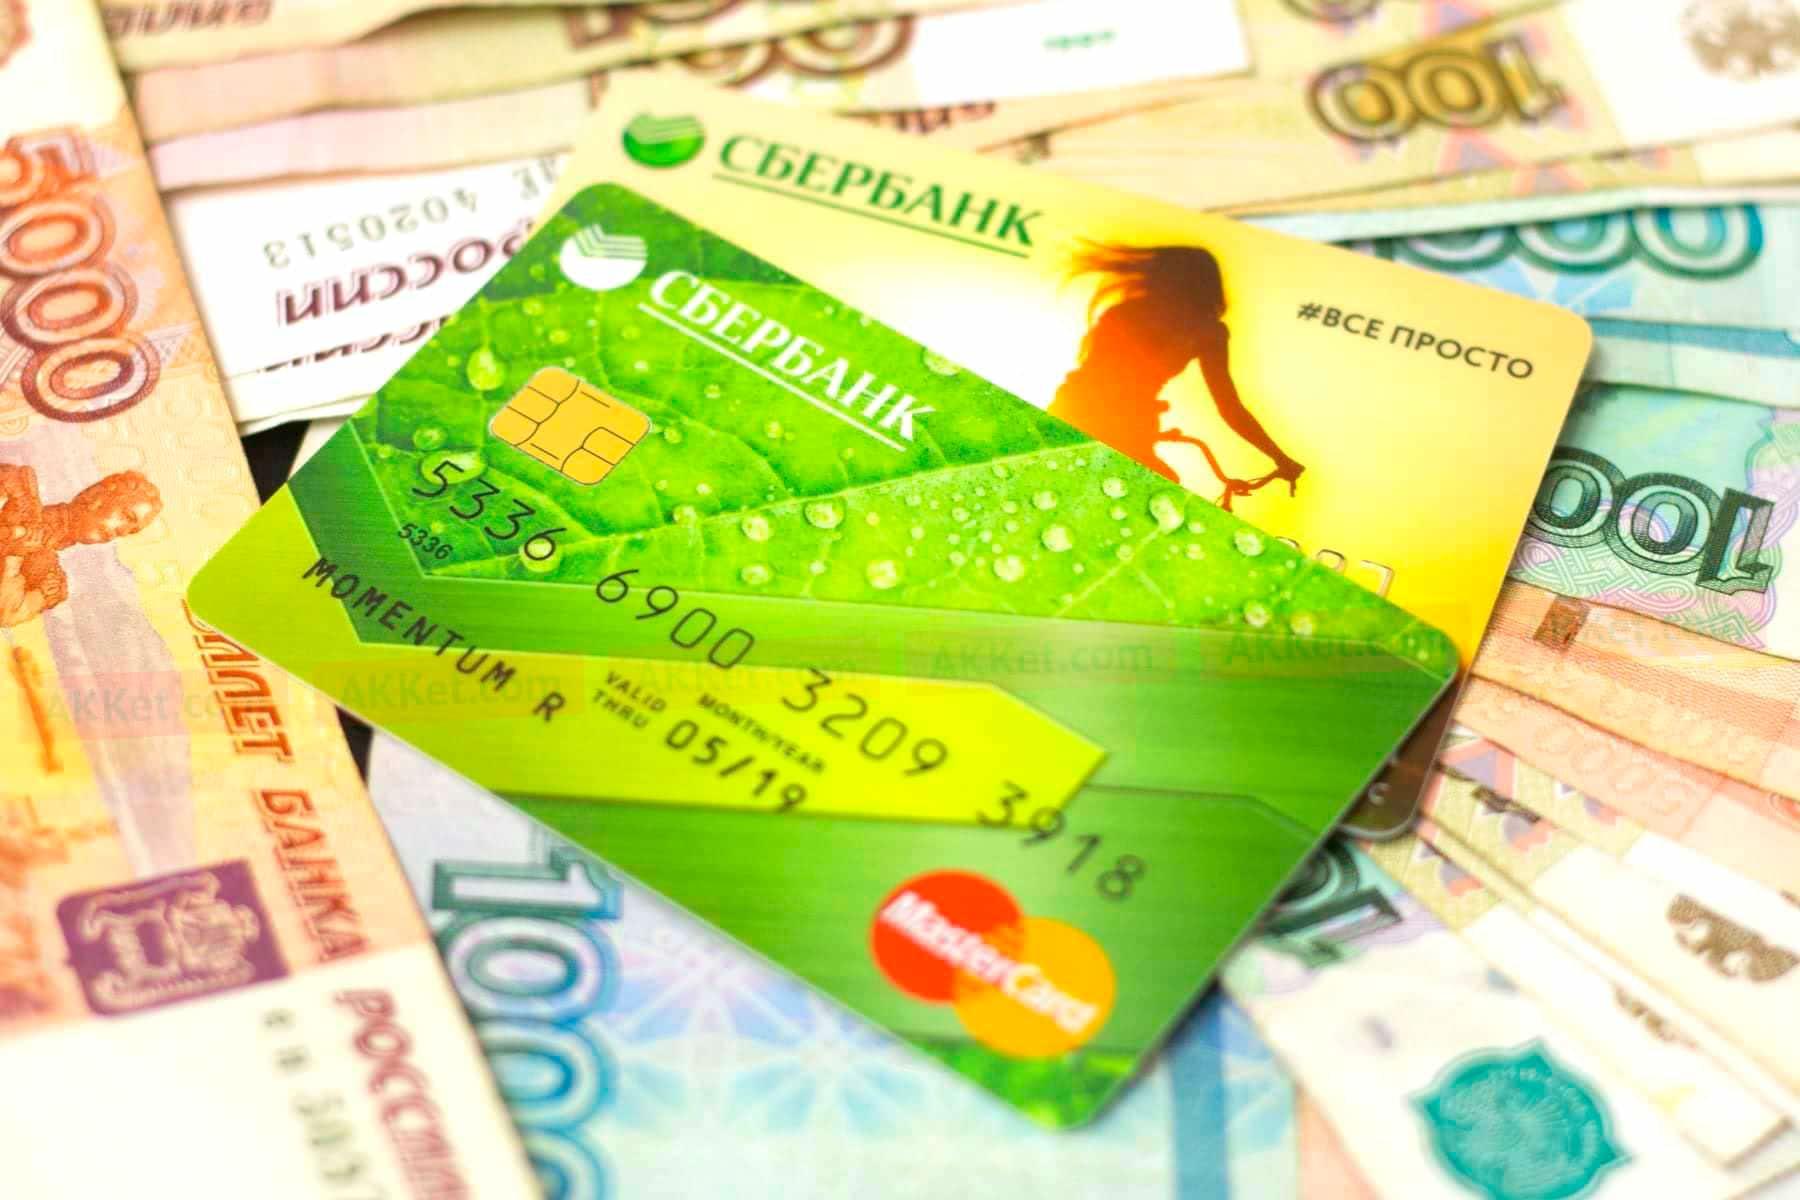 Sberbank-Vyplata-Deneg-Rossiya.jpg